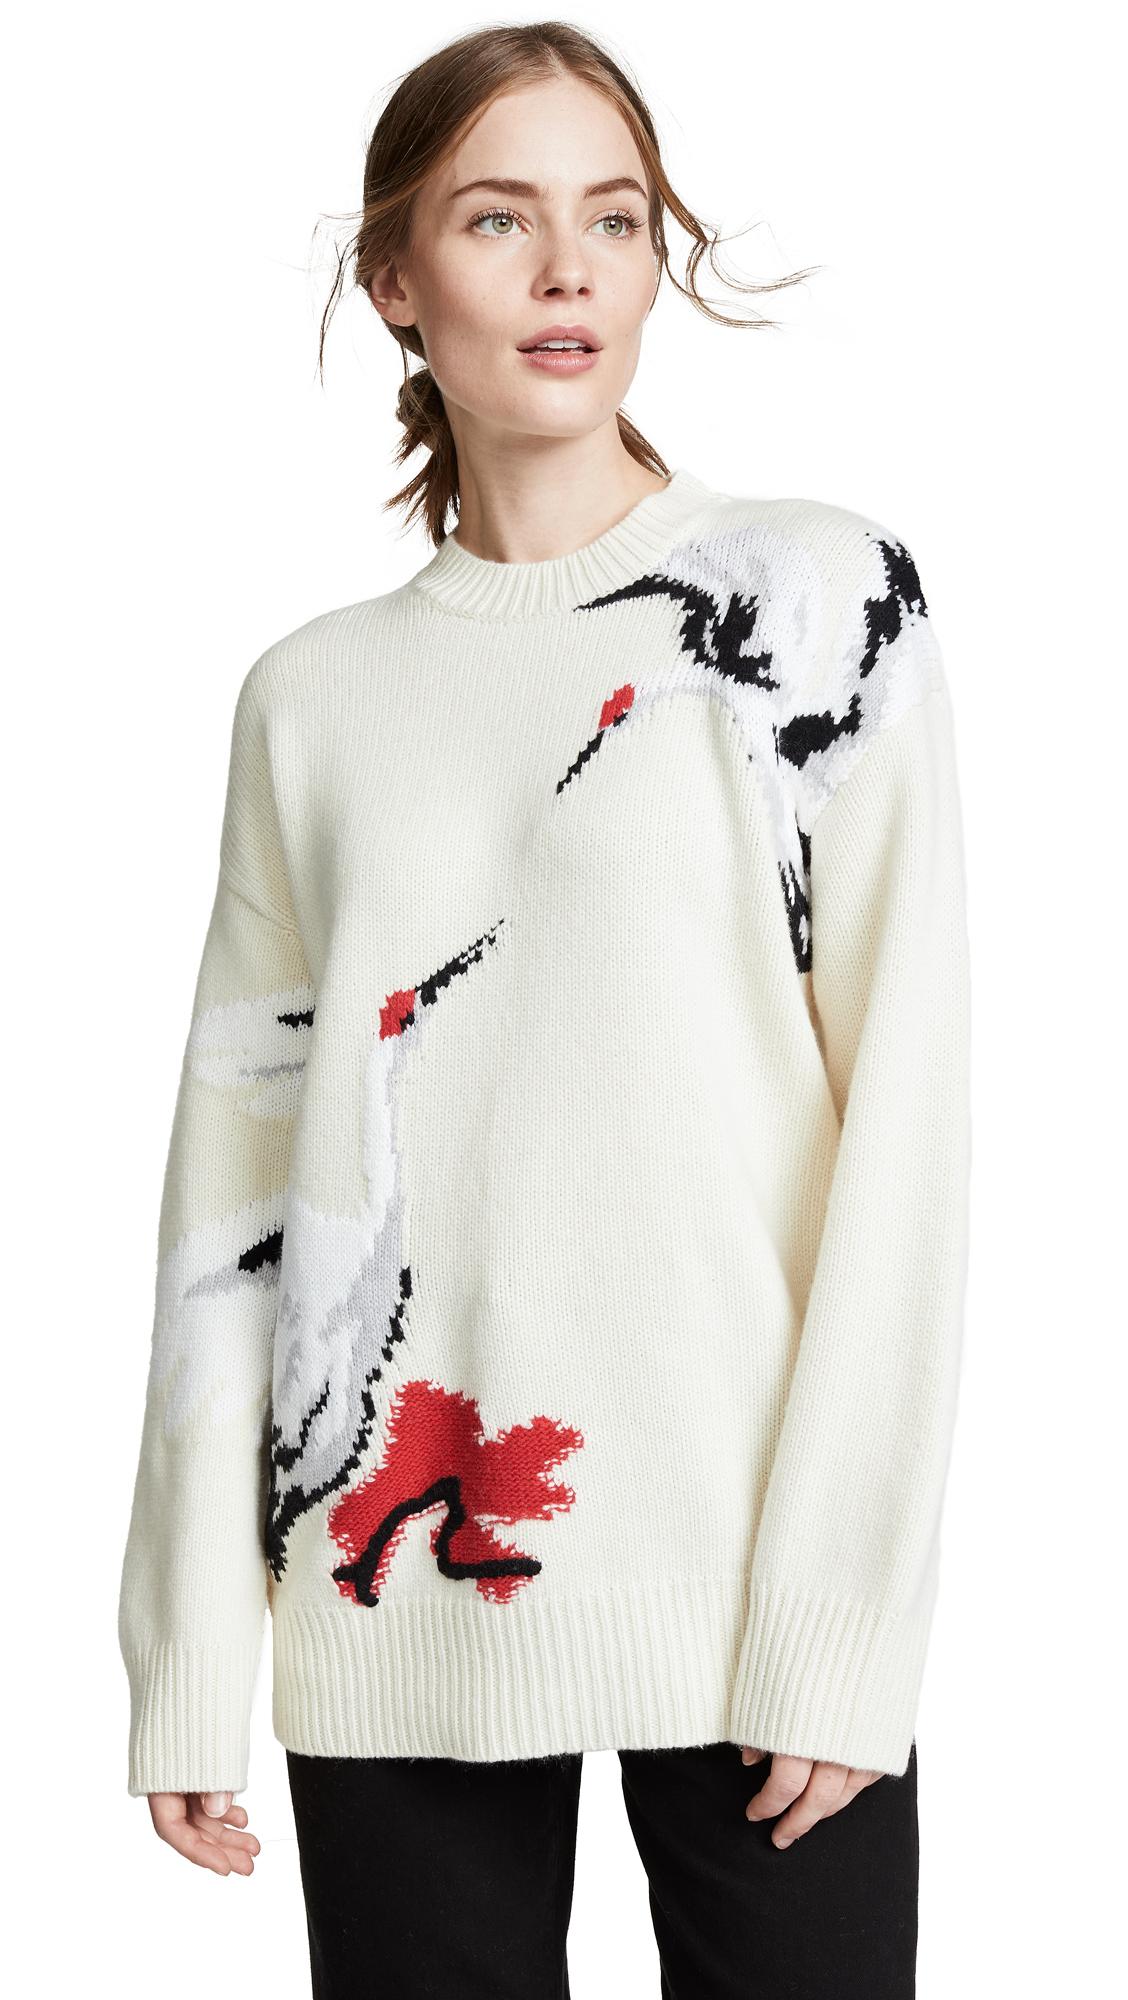 Swan Sweater in Gardenia